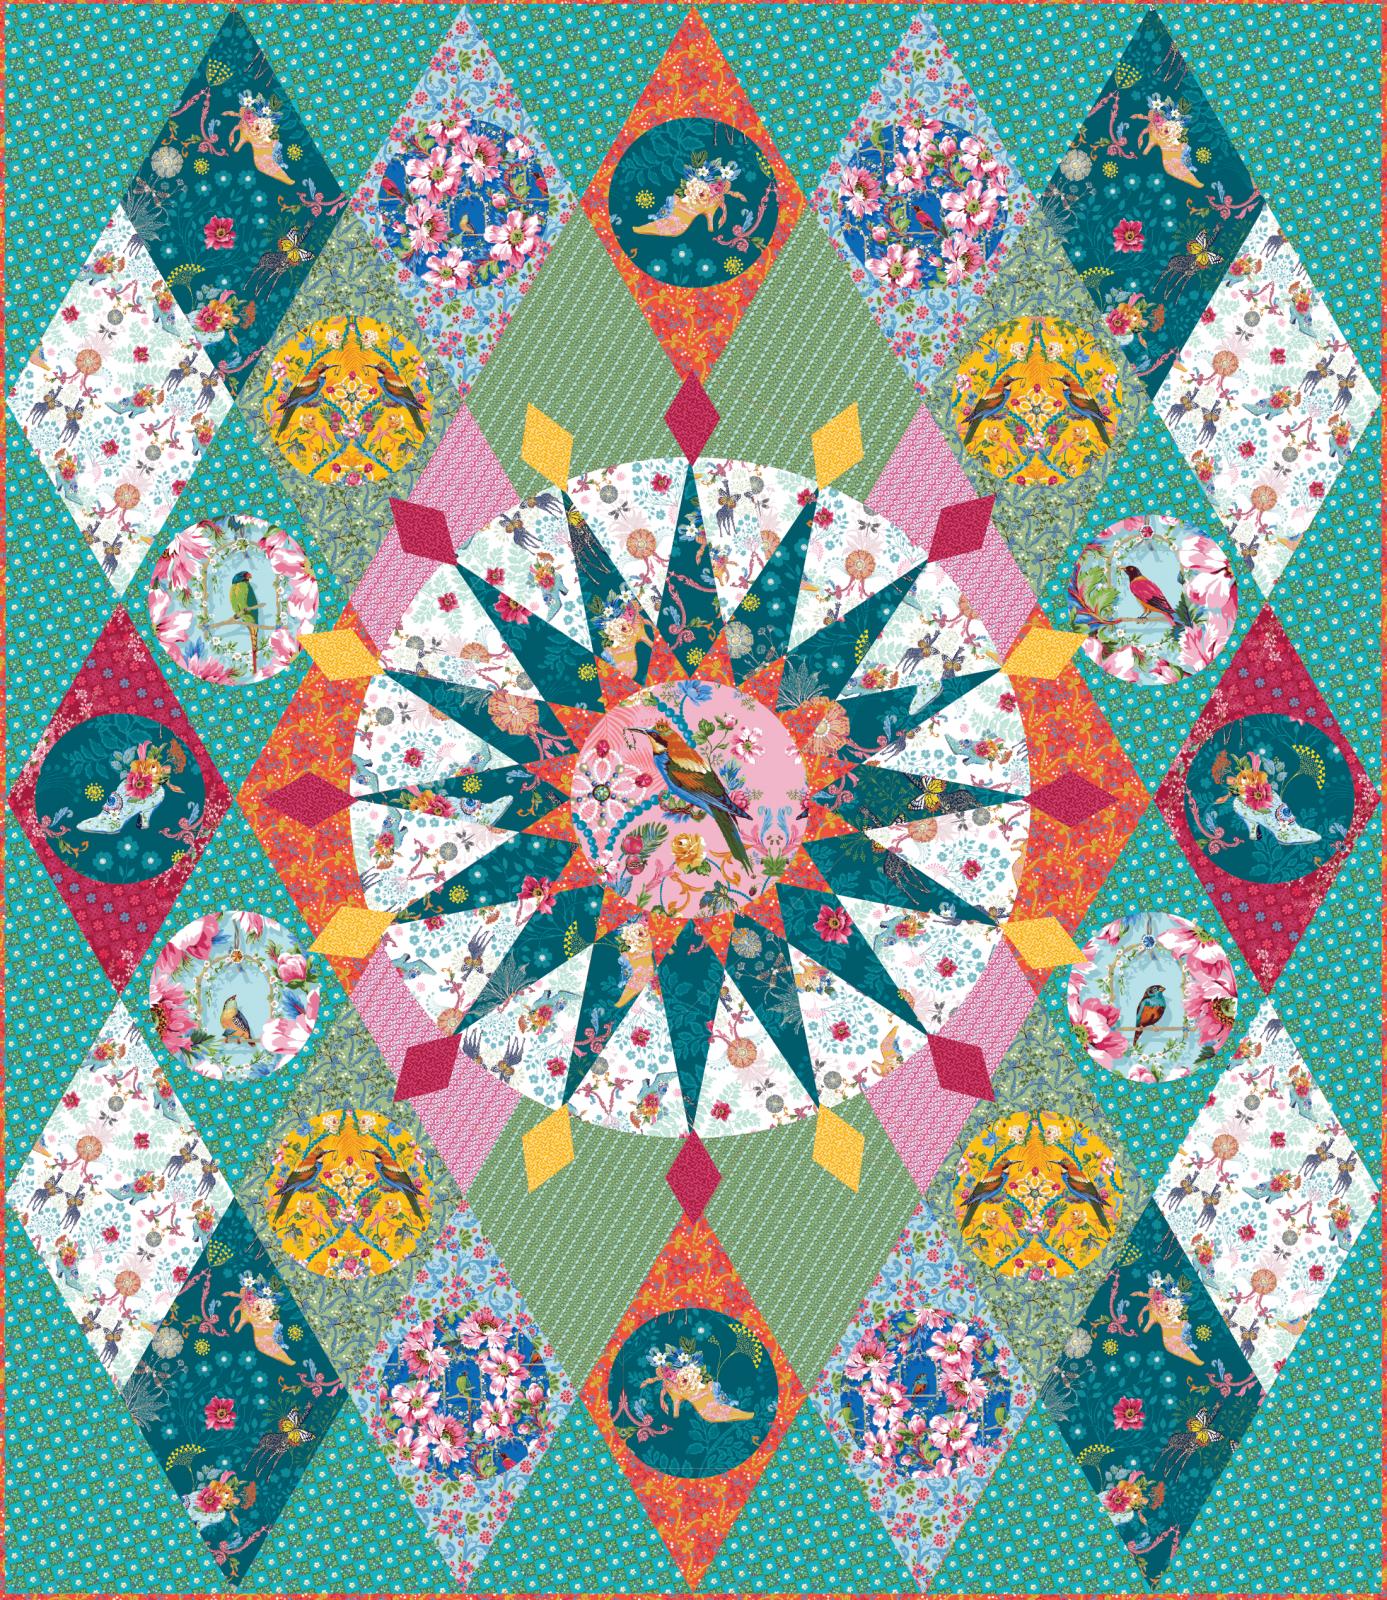 The Queen's Dream Quilt Kit for Jardin de la Reine by Odile Bailloeul